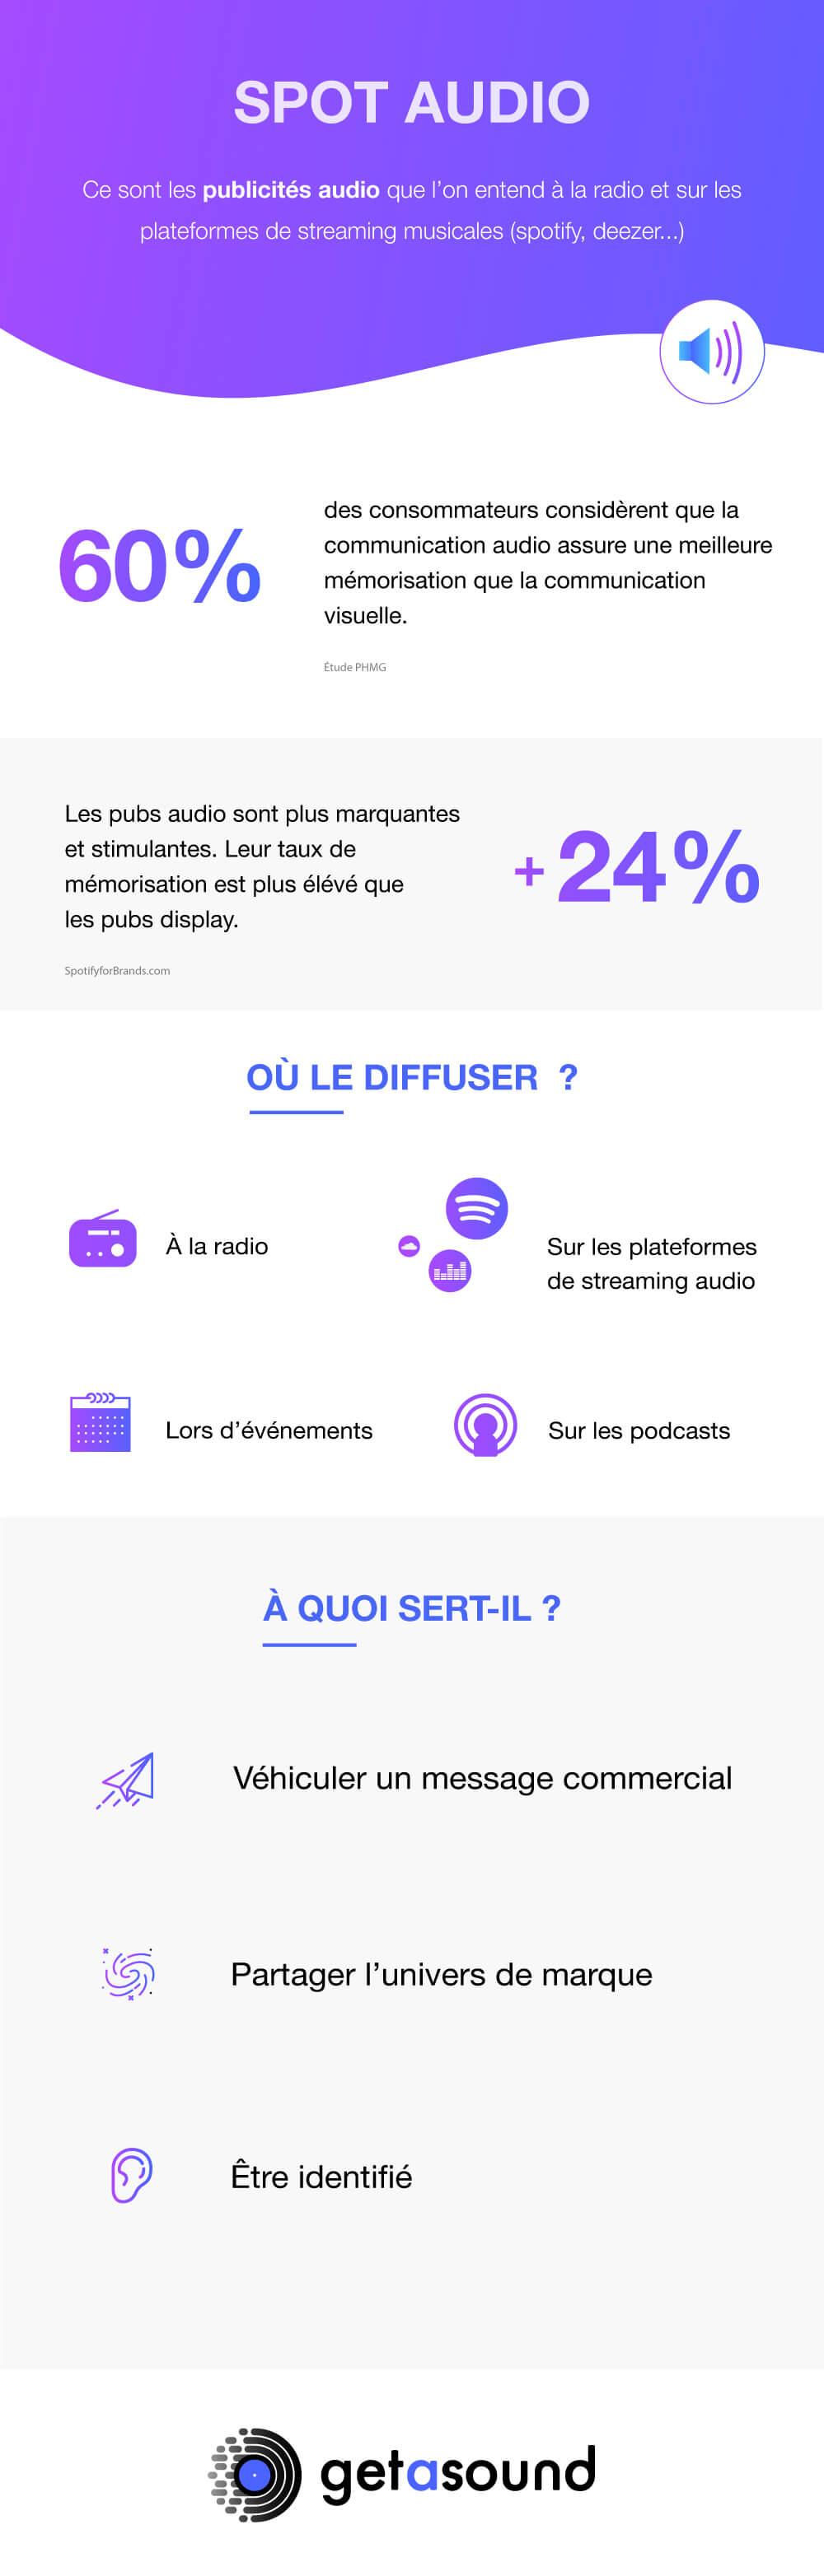 Infographie spot audio